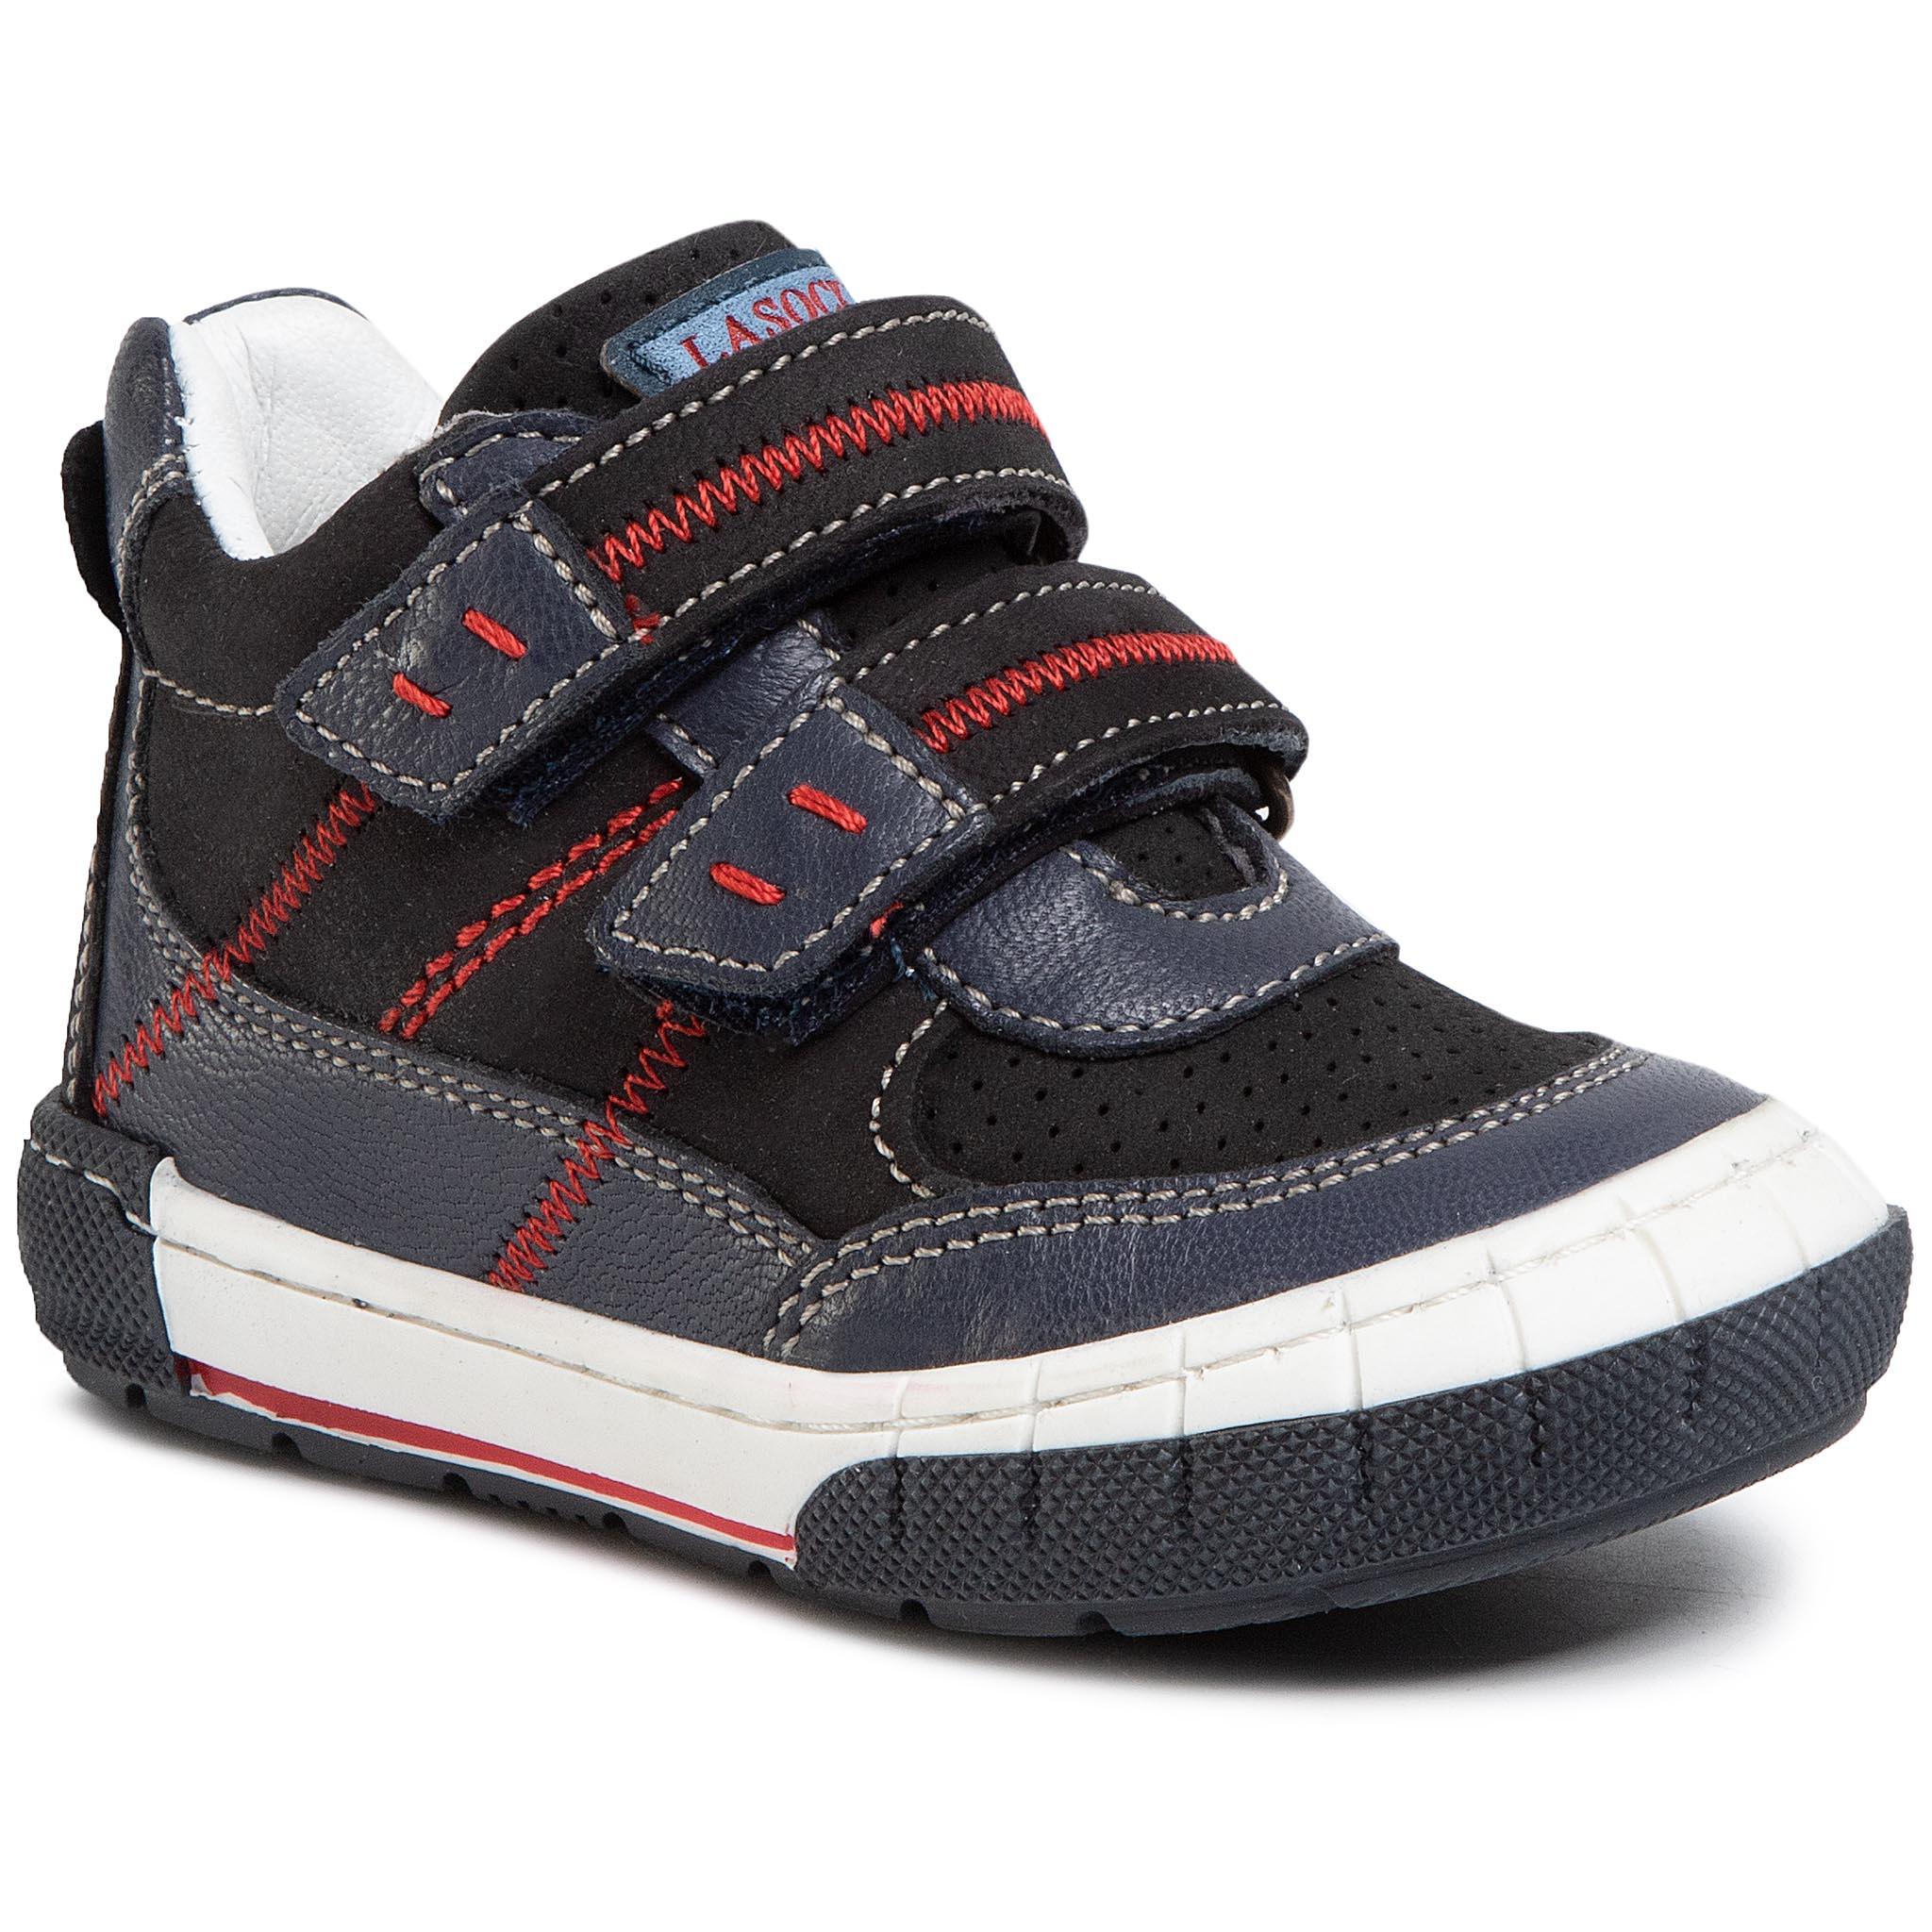 Outdoorová obuv LASOCKI KIDS - CI12-2689-04 Cobalt Blue